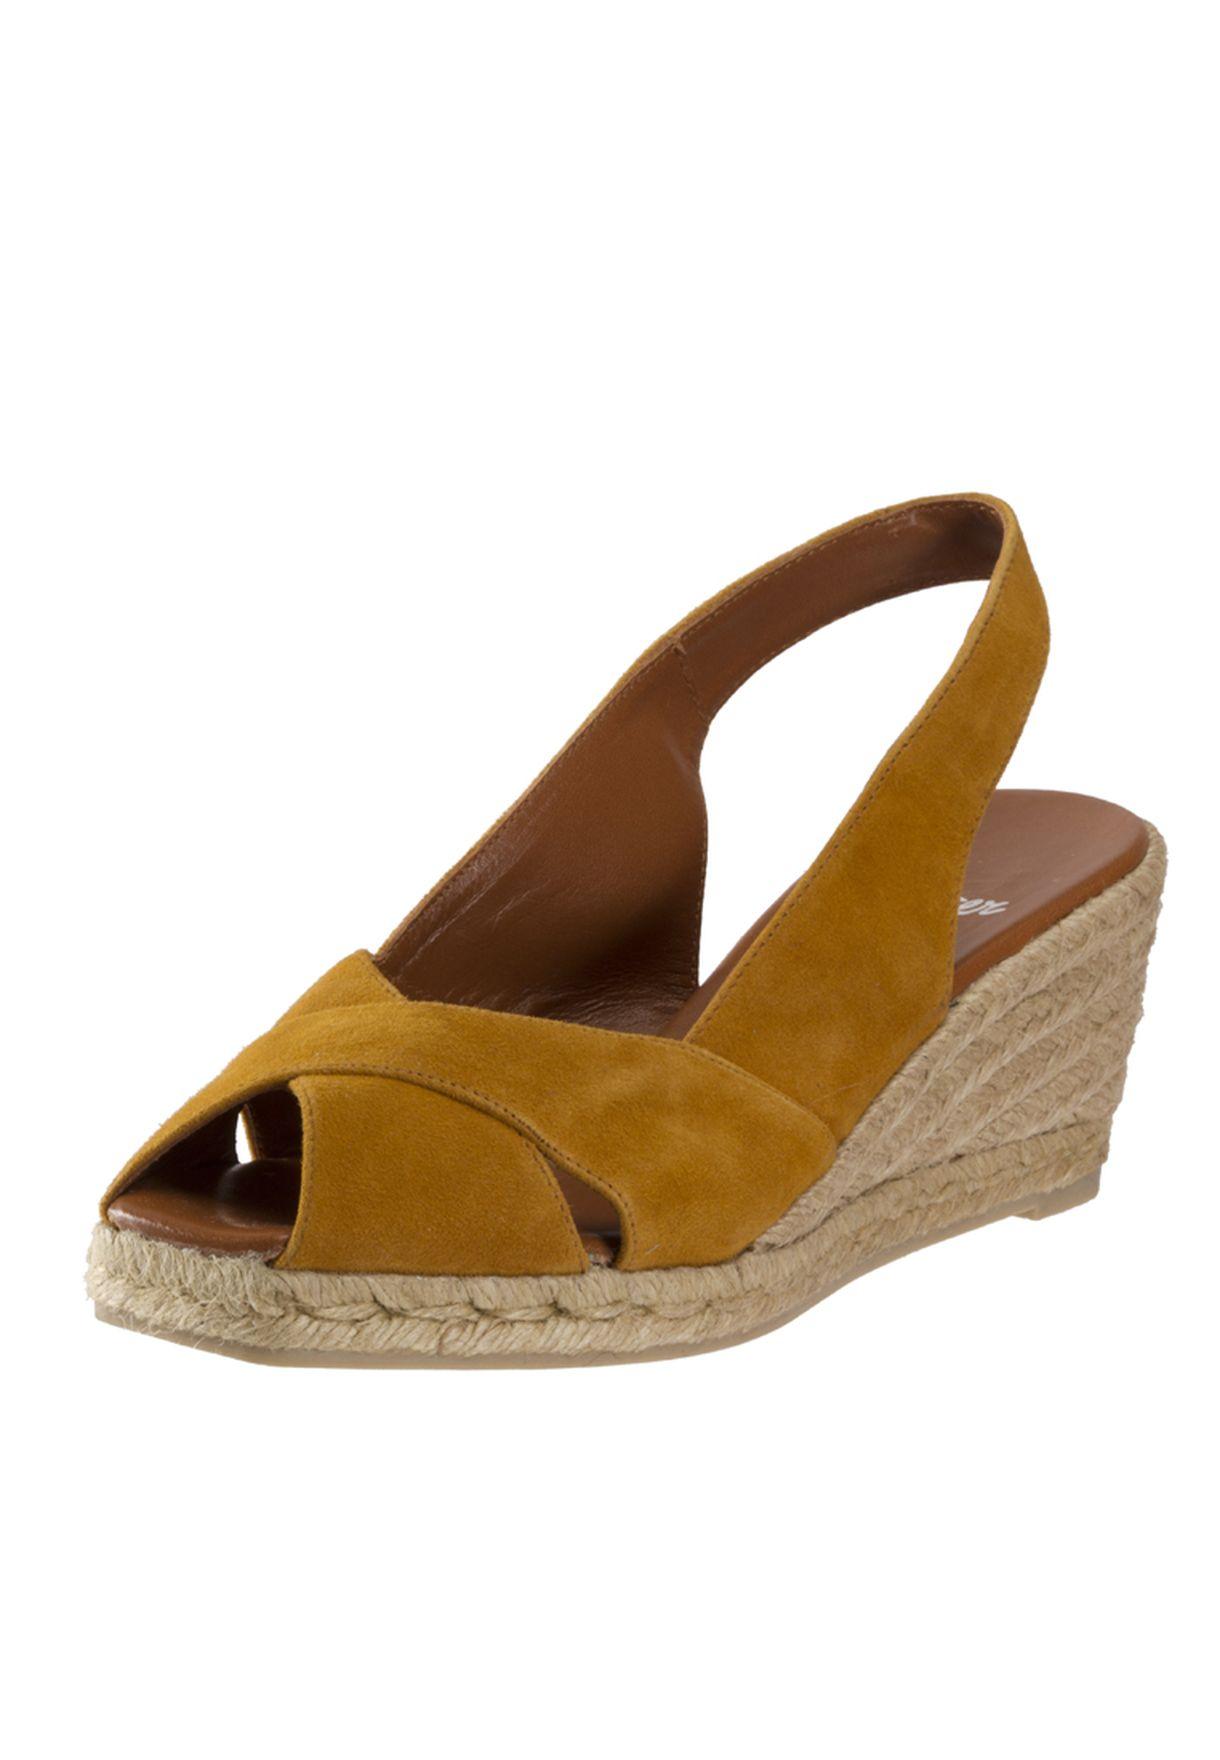 aa8404fa548 Doris Wedge Sandals